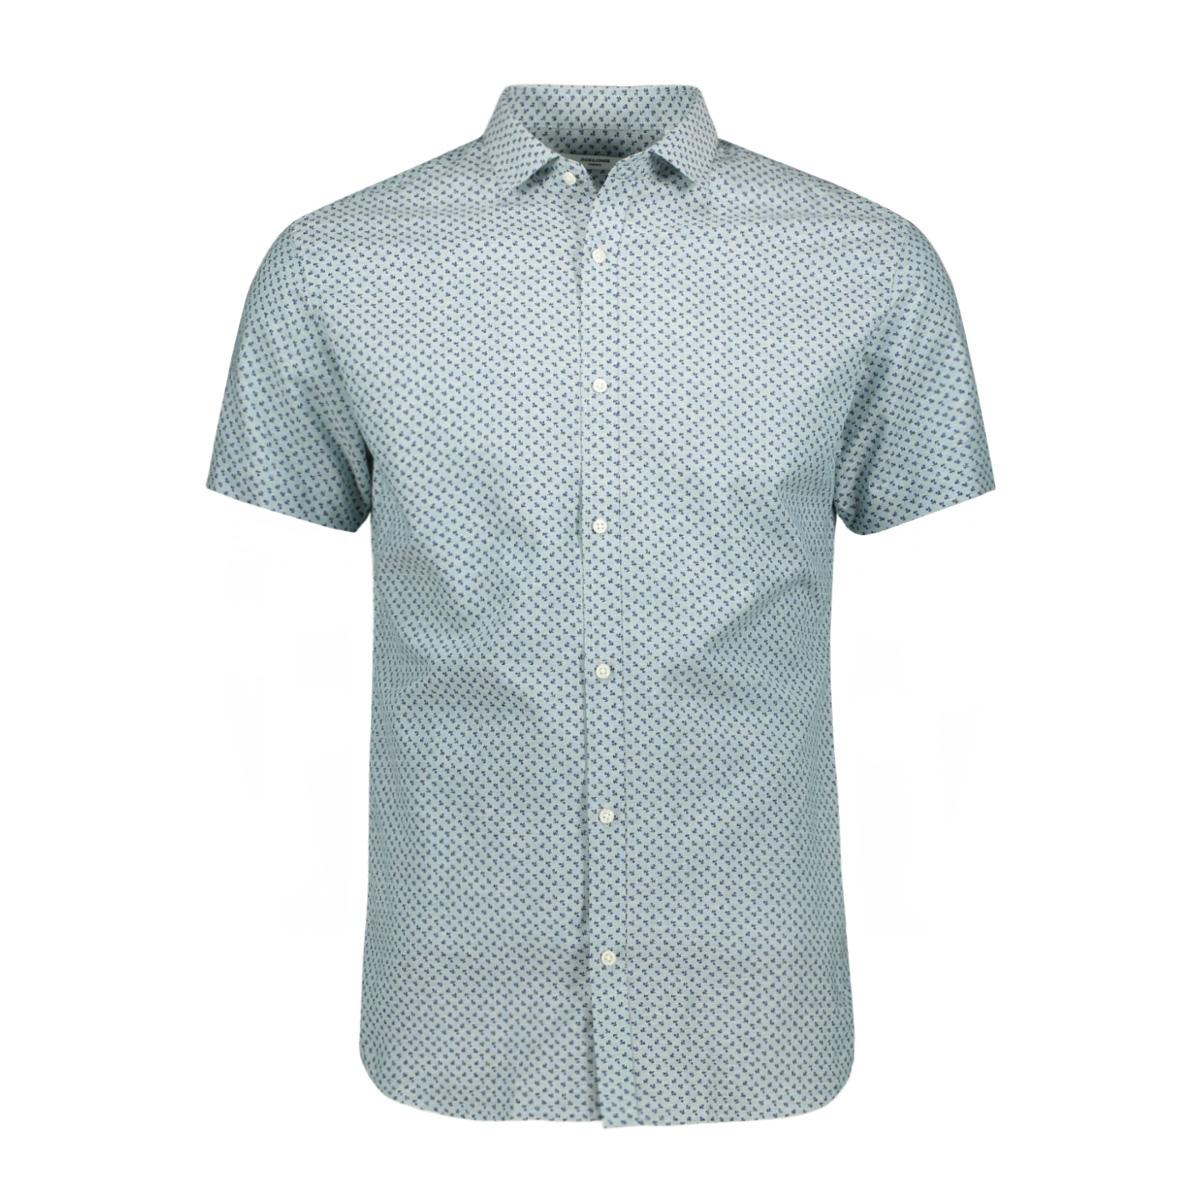 jprsummer blackburn shirt s/s 12152774 jack & jones overhemd arctic/slim fit